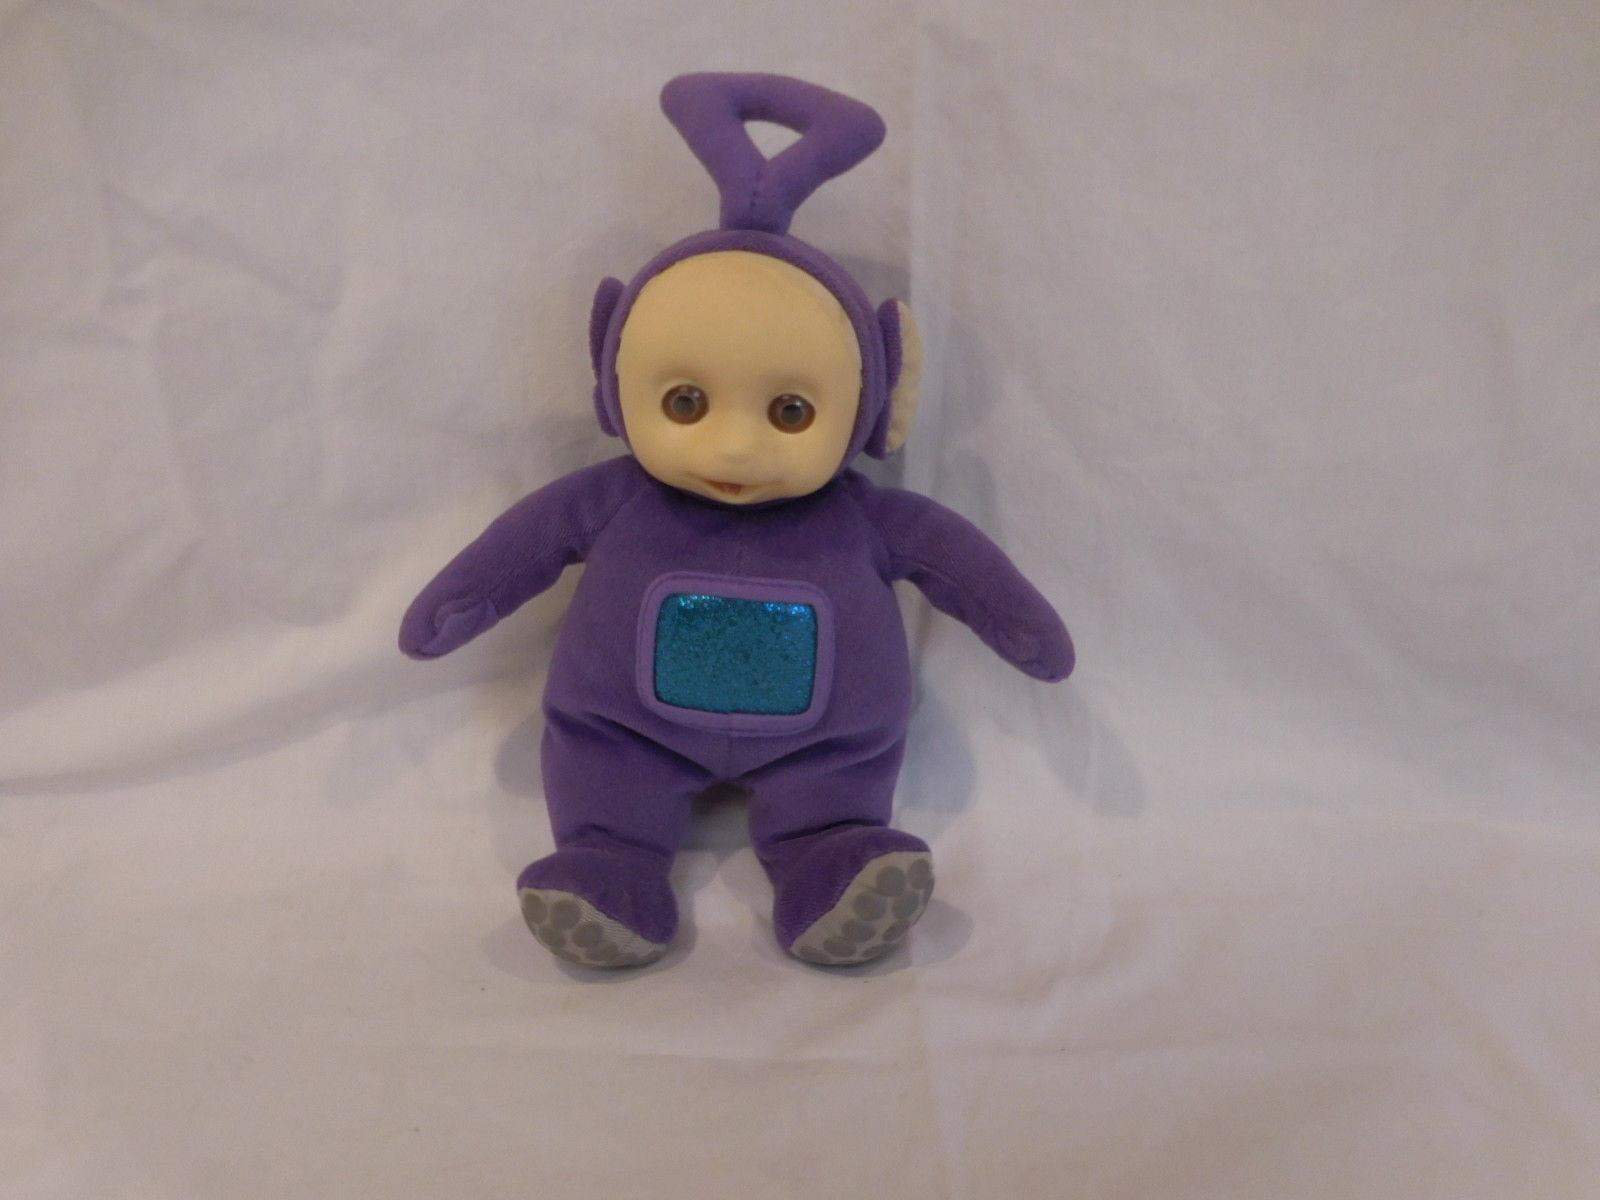 Tinky Winky Teletubbies Vtg 1998 Purple Non Talking Stuffed Plush eden - $15.02